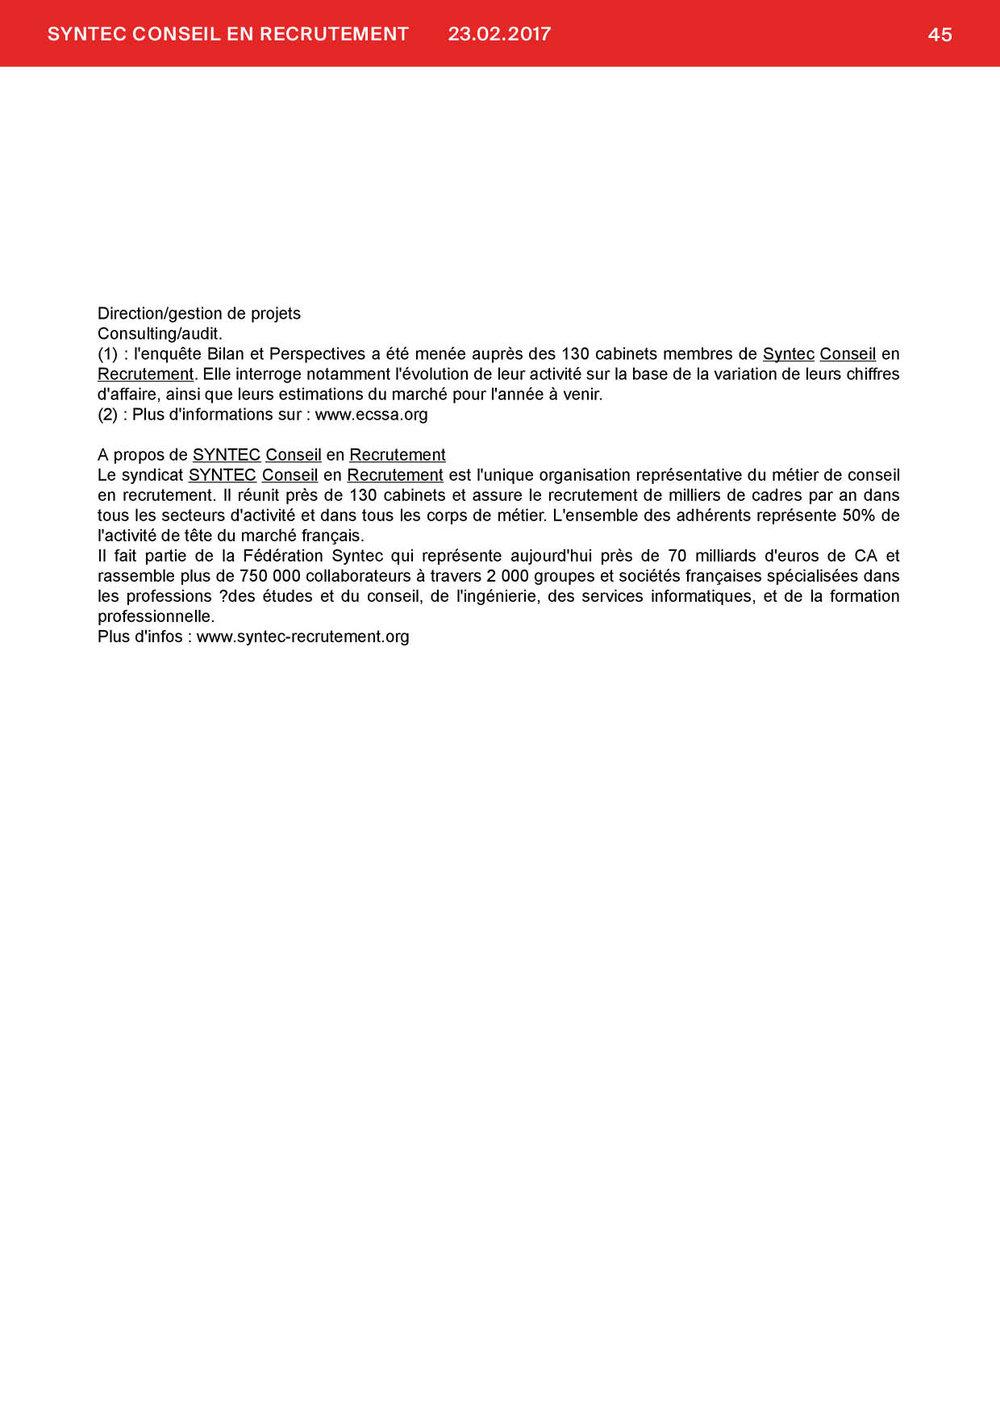 BOOKMEDIA_FEV45.jpg